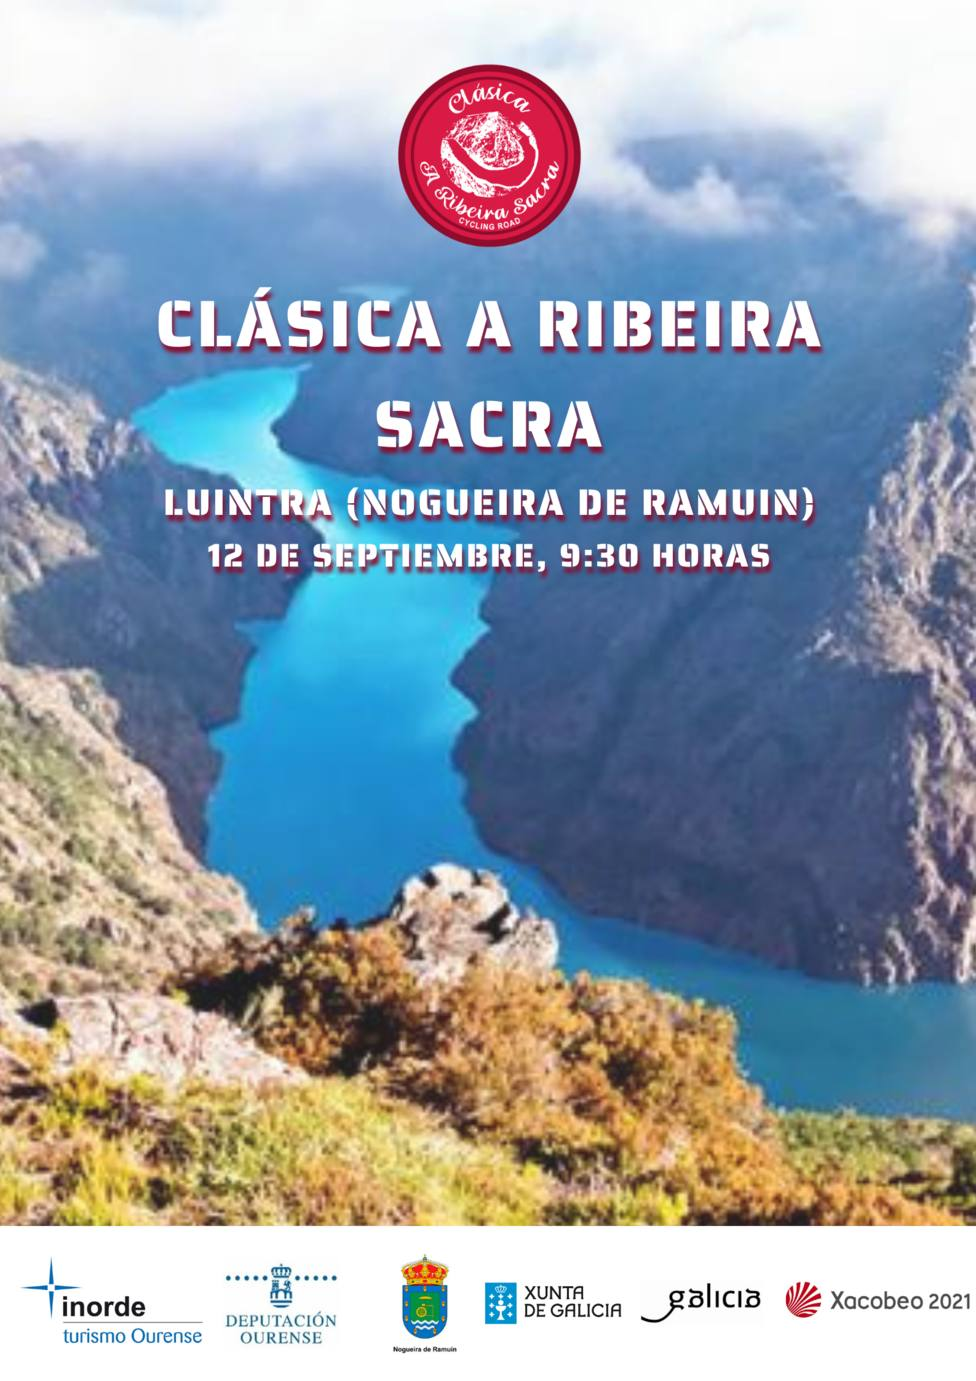 Clásica A Ribeira Sacra